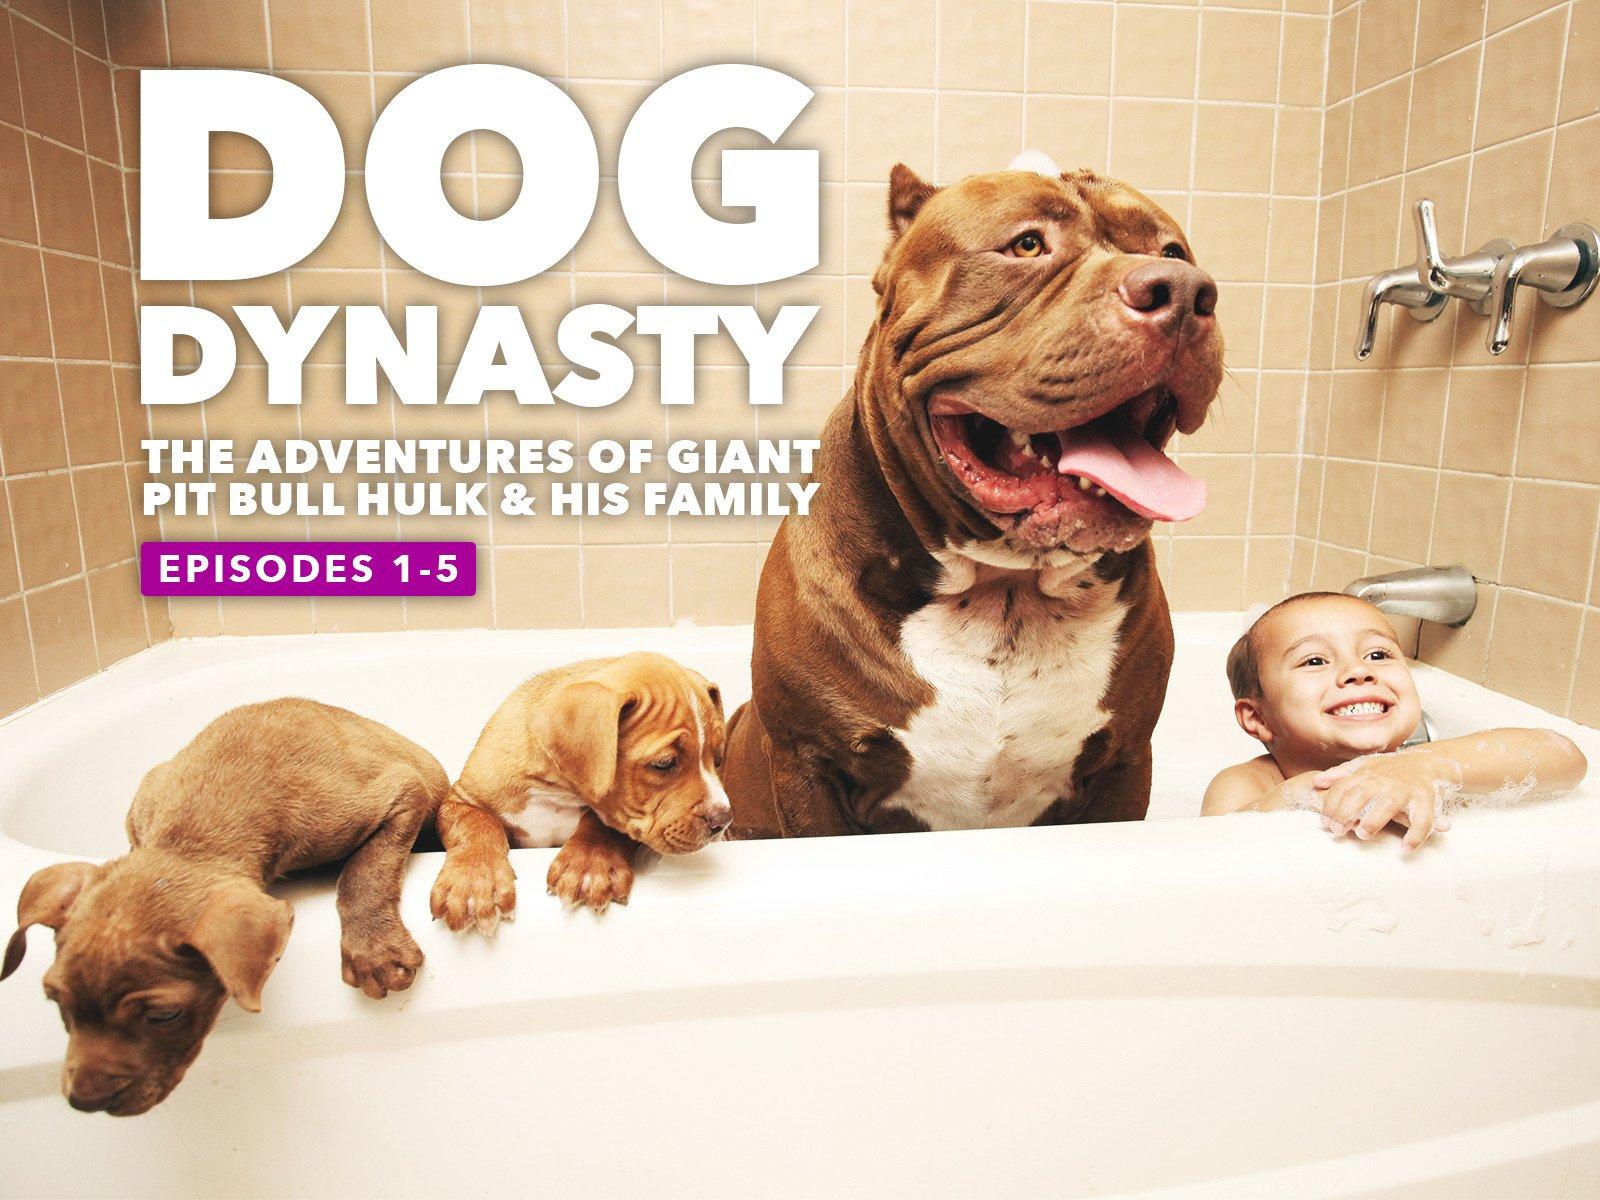 ebf8673ca78 Amazon.com  Watch Dog Dynasty